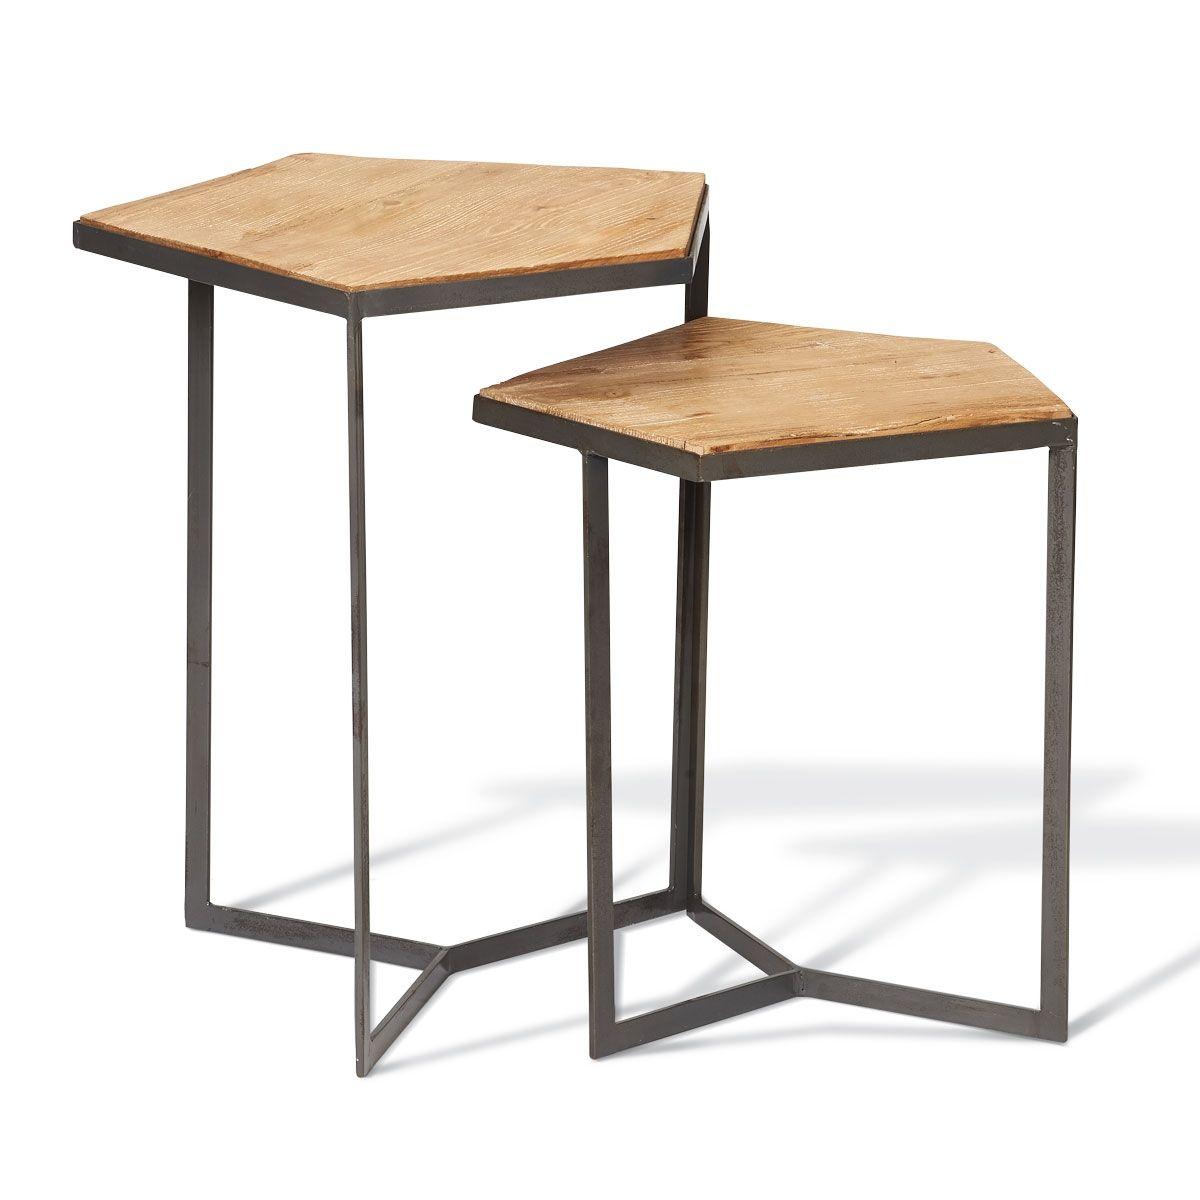 Foreside Home & Garden - Pentagon Tables, Set of 2 | Trend Alert ...